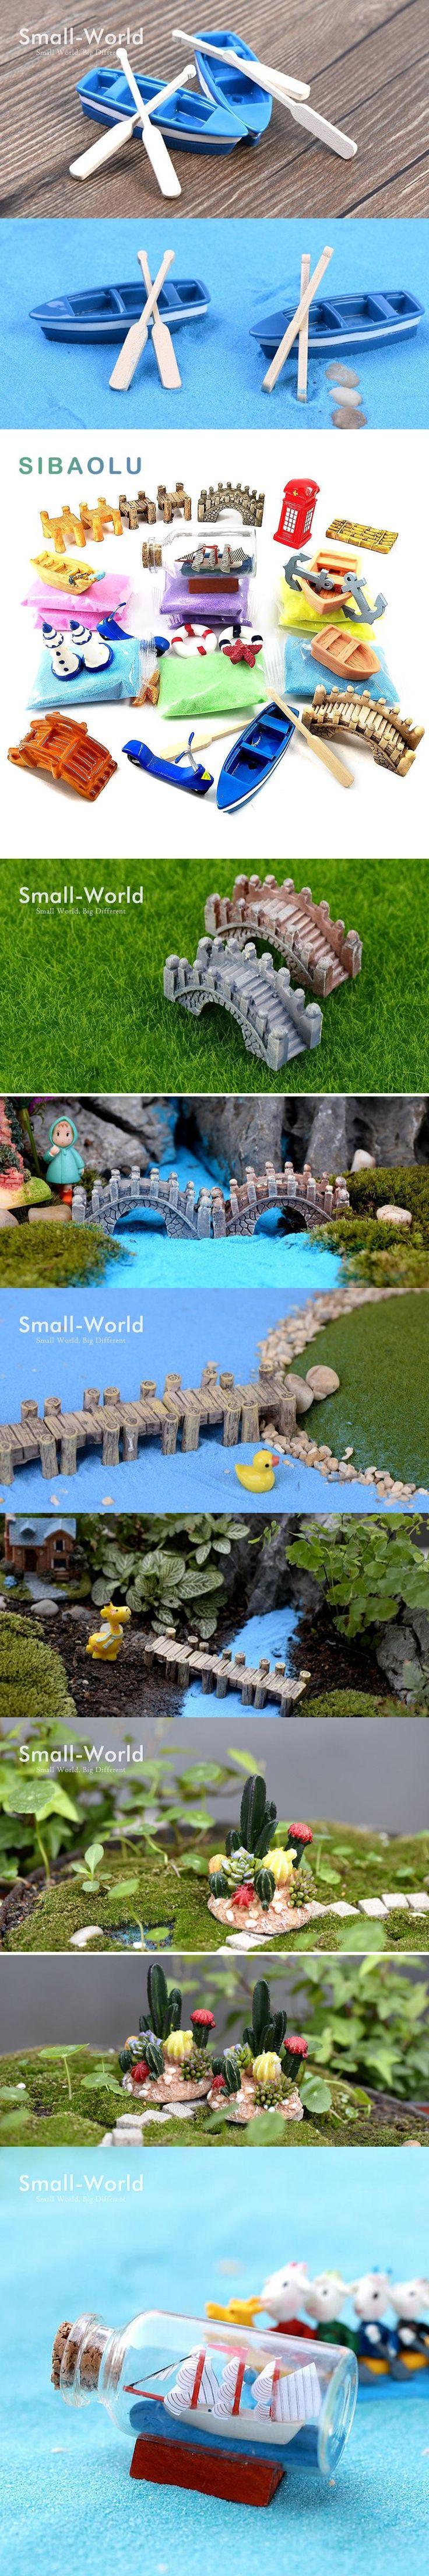 Micro landscape Magic Sand bonsai Miniature Figurine fairy garden Aquarium fish tank animal statue home decoration accessories